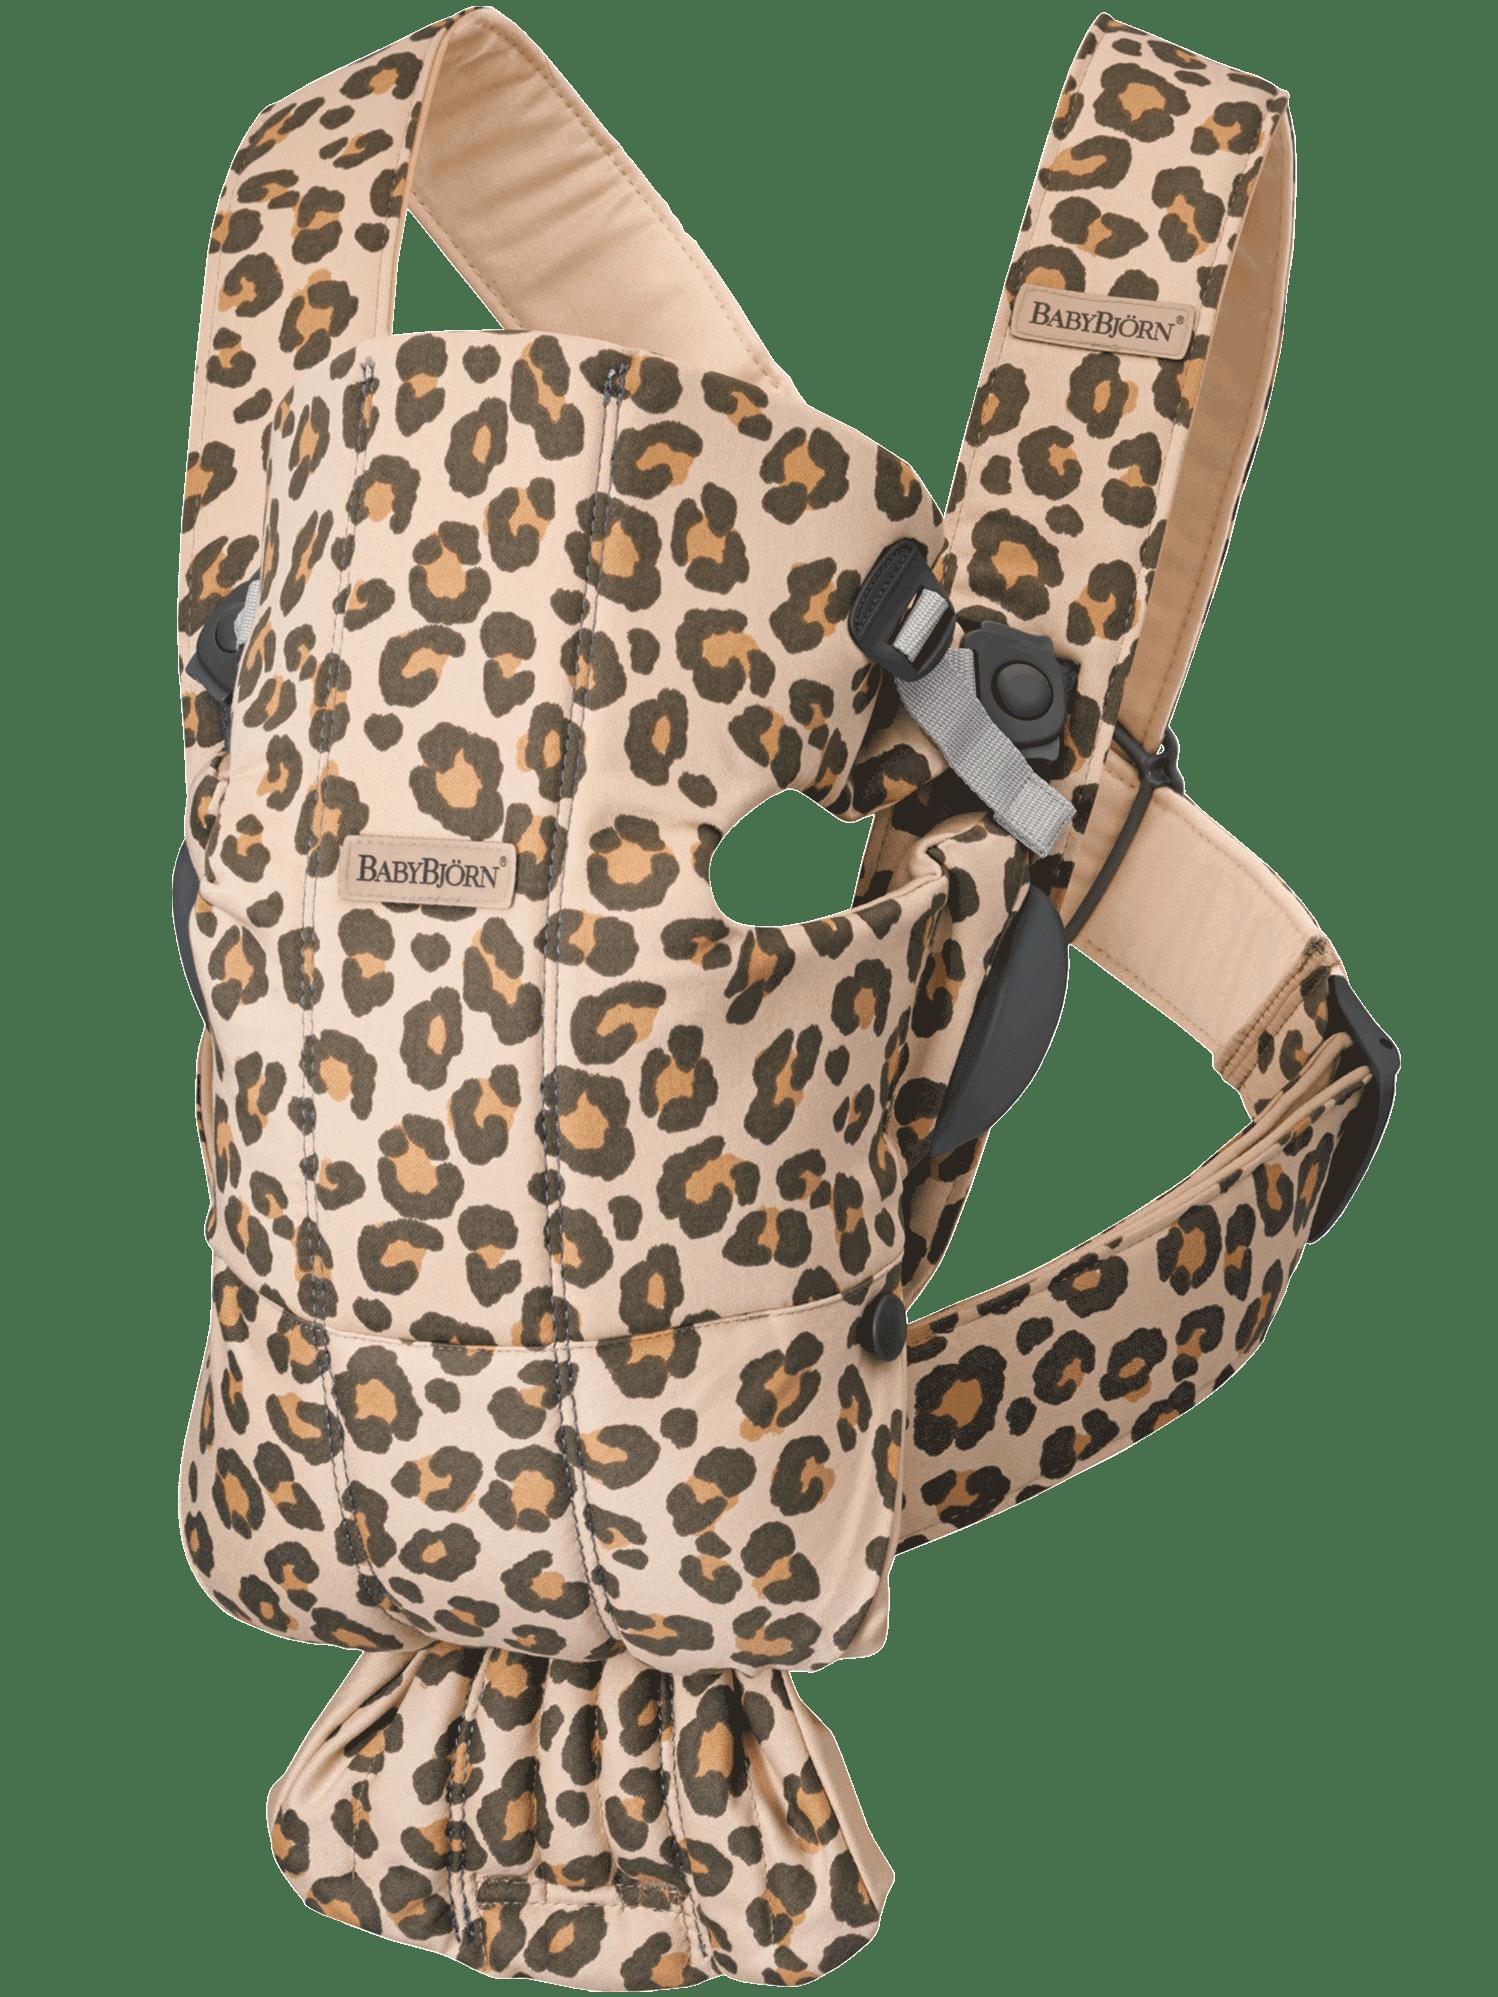 BABYBJÖRN Babytrage Mini - Beige/Leopard, Baumwolle